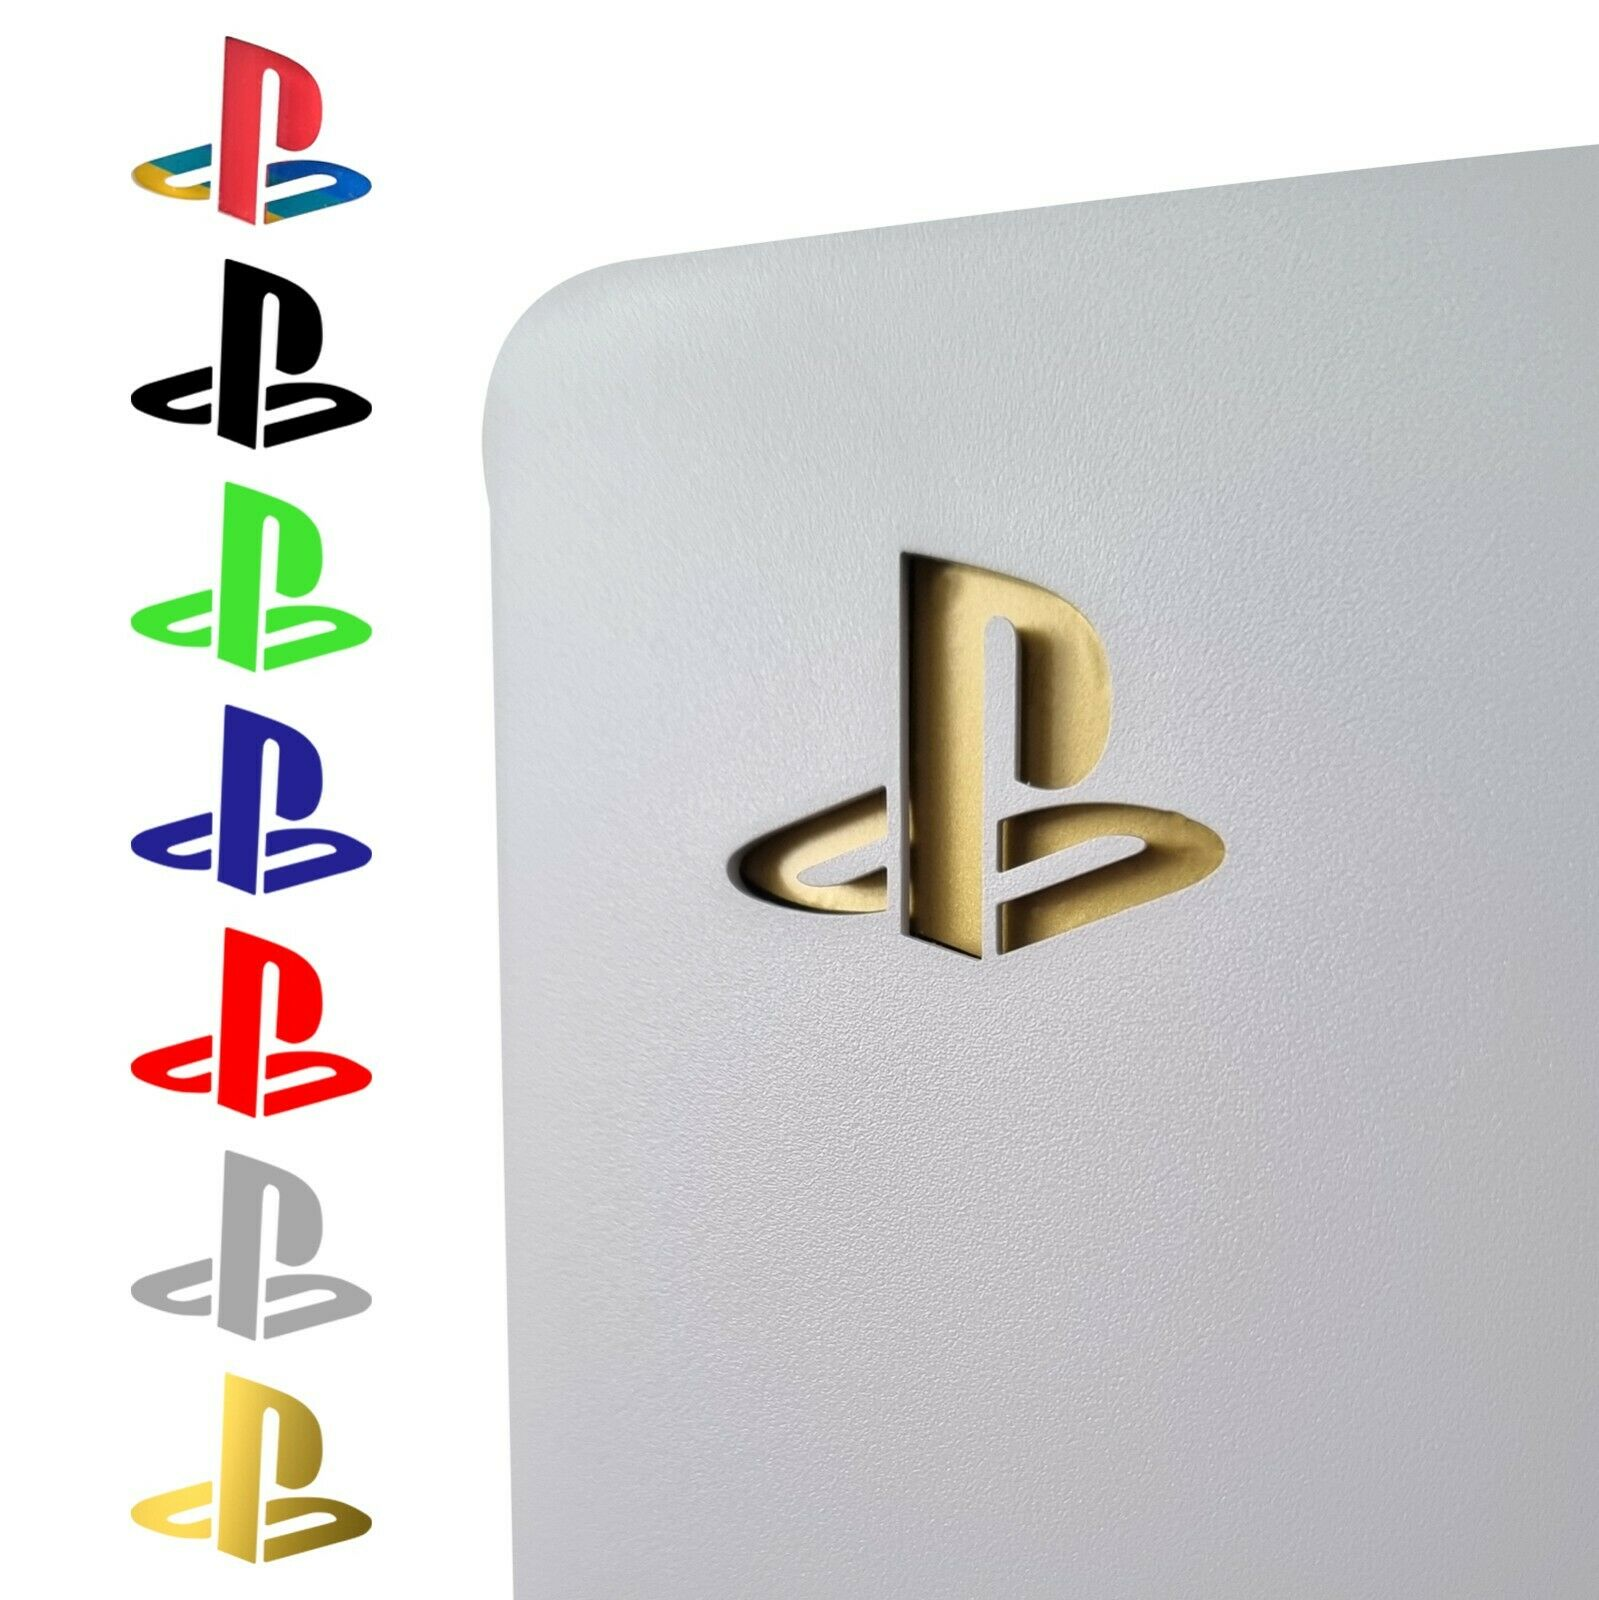 PS5 Retro Playstation Logo Vinyl Sticker Decal Skin Underlay 7 Coloured Designs